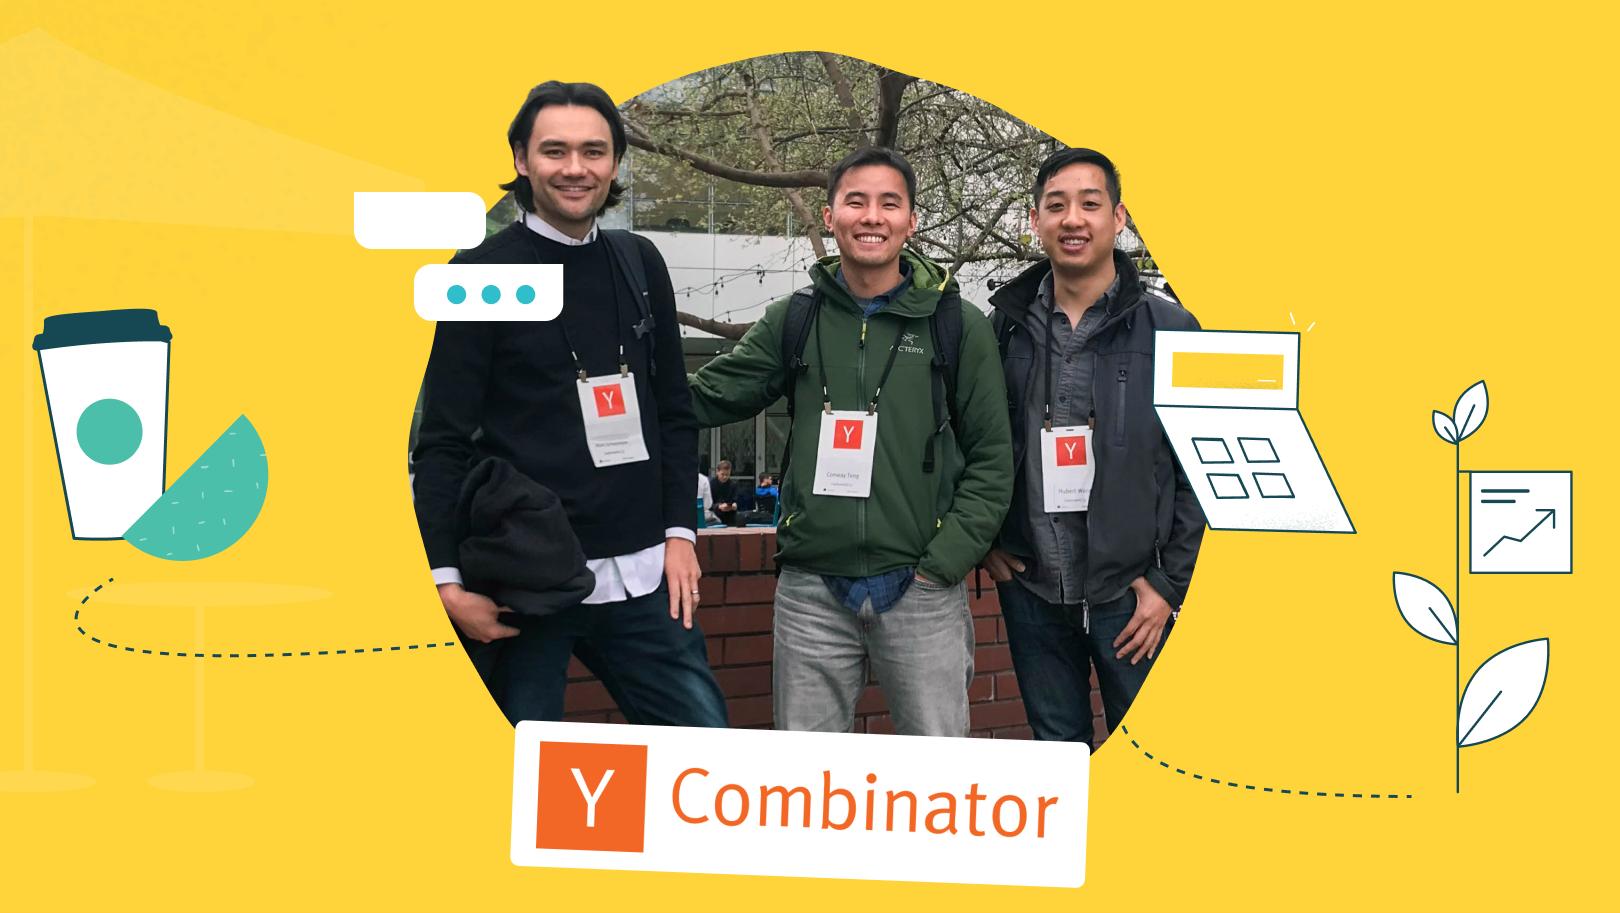 CaptivateIQ Recognized in Y Combinator's Top Companies List